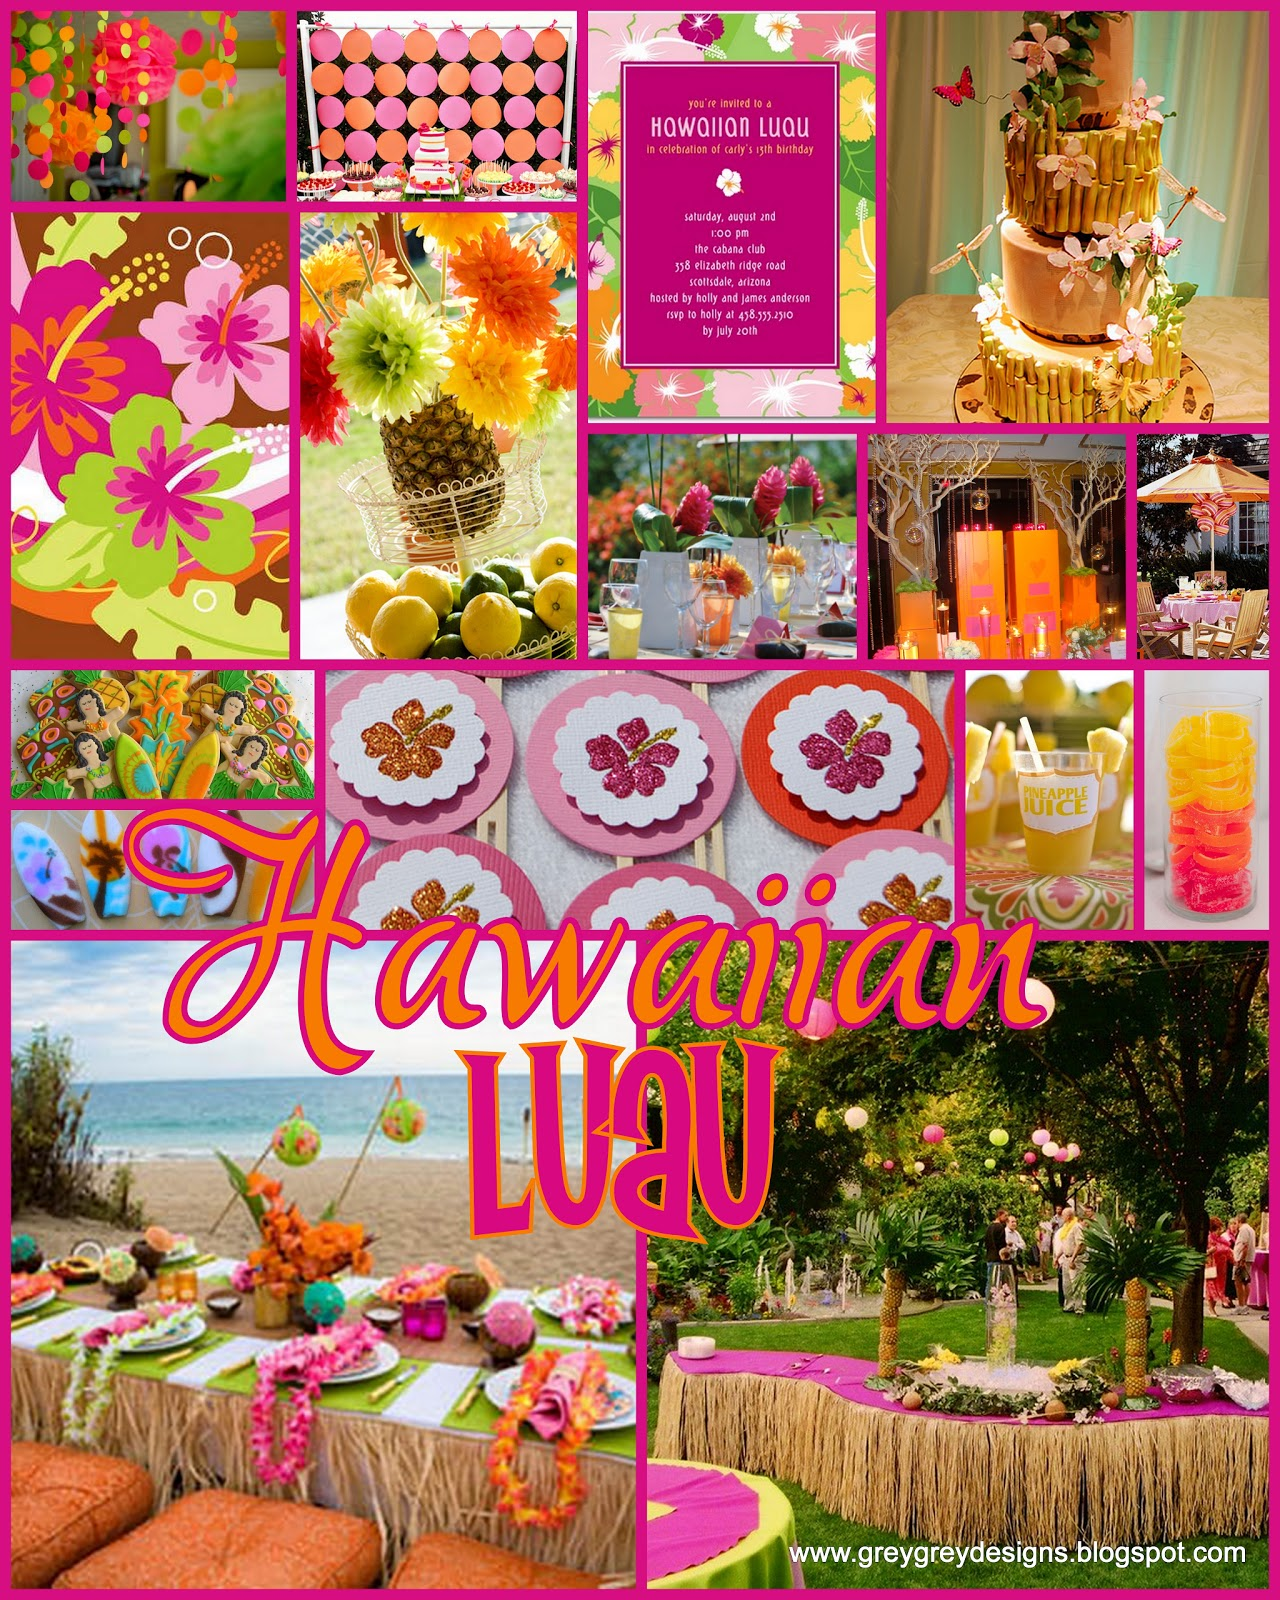 GreyGrey Designs: Chic Hawaiian Luau Inspiration Board